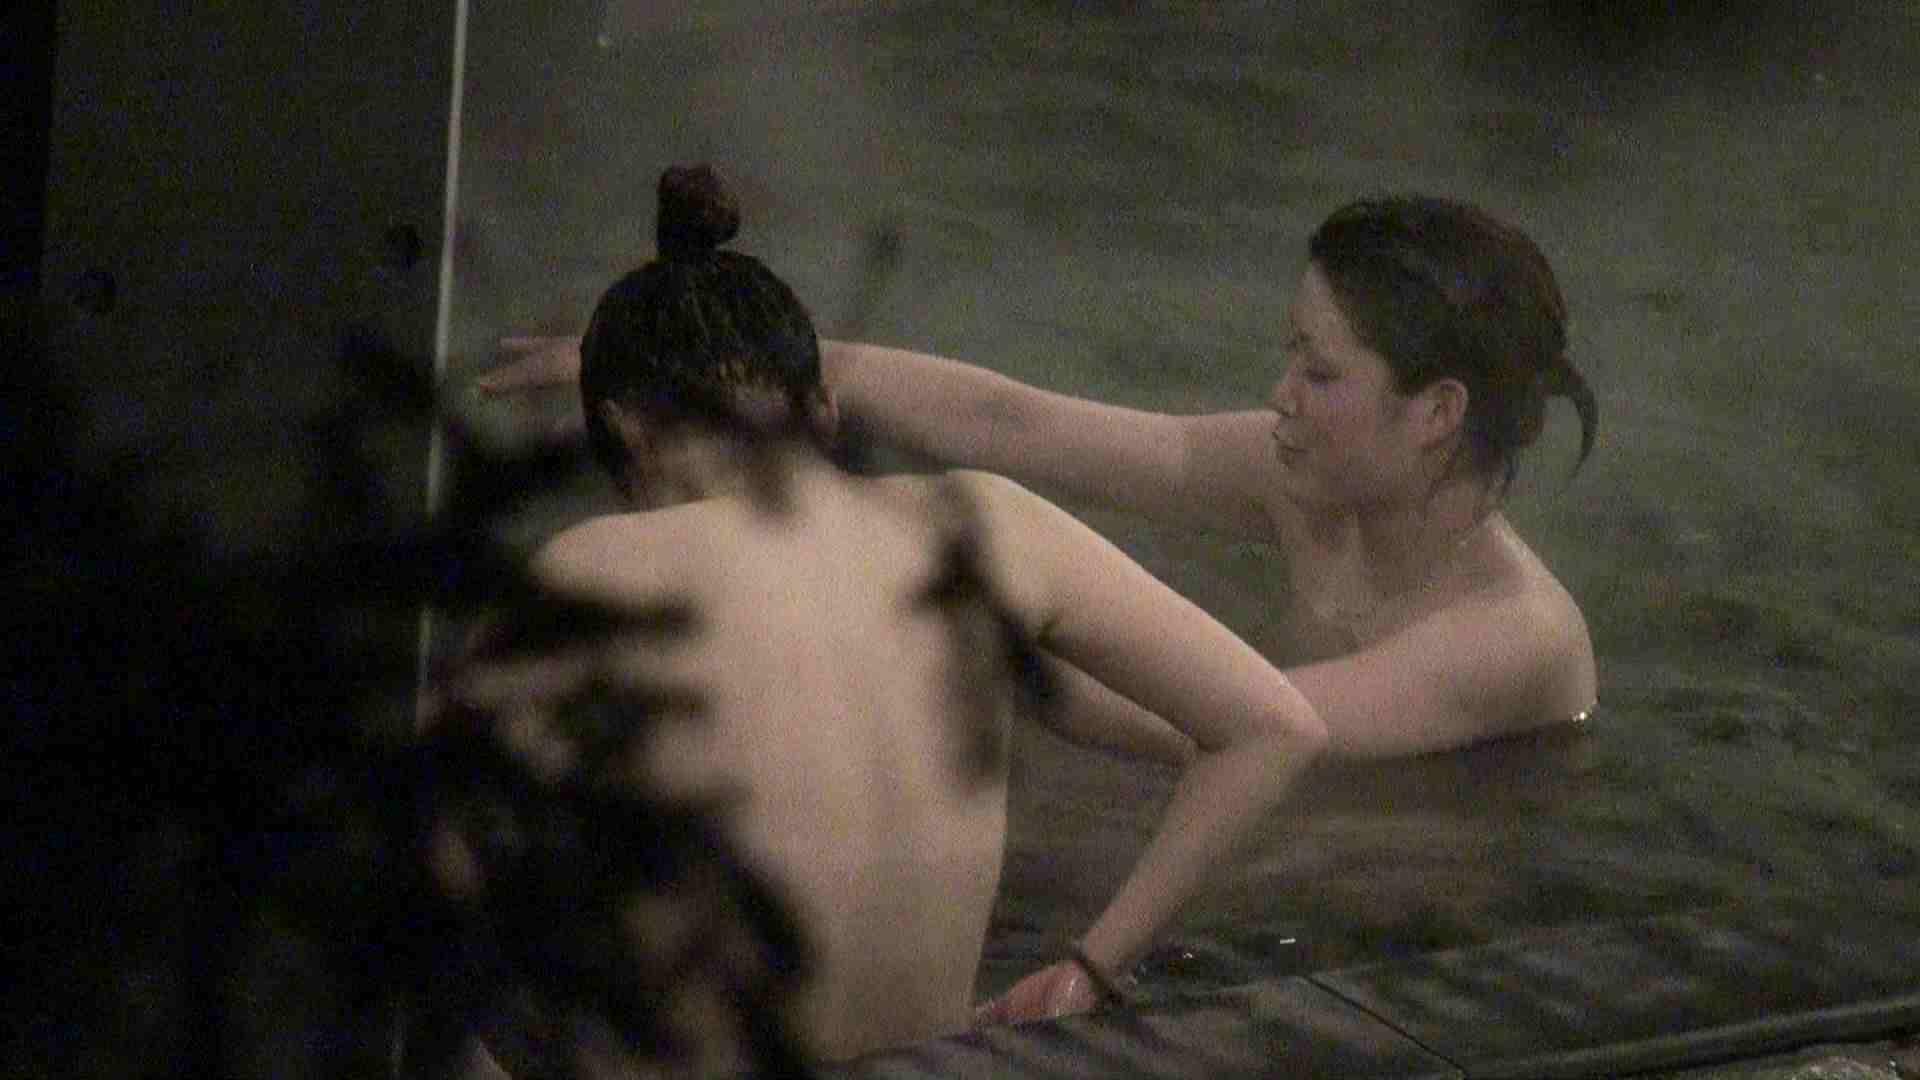 Aquaな露天風呂Vol.365 OL女体  72連発 9